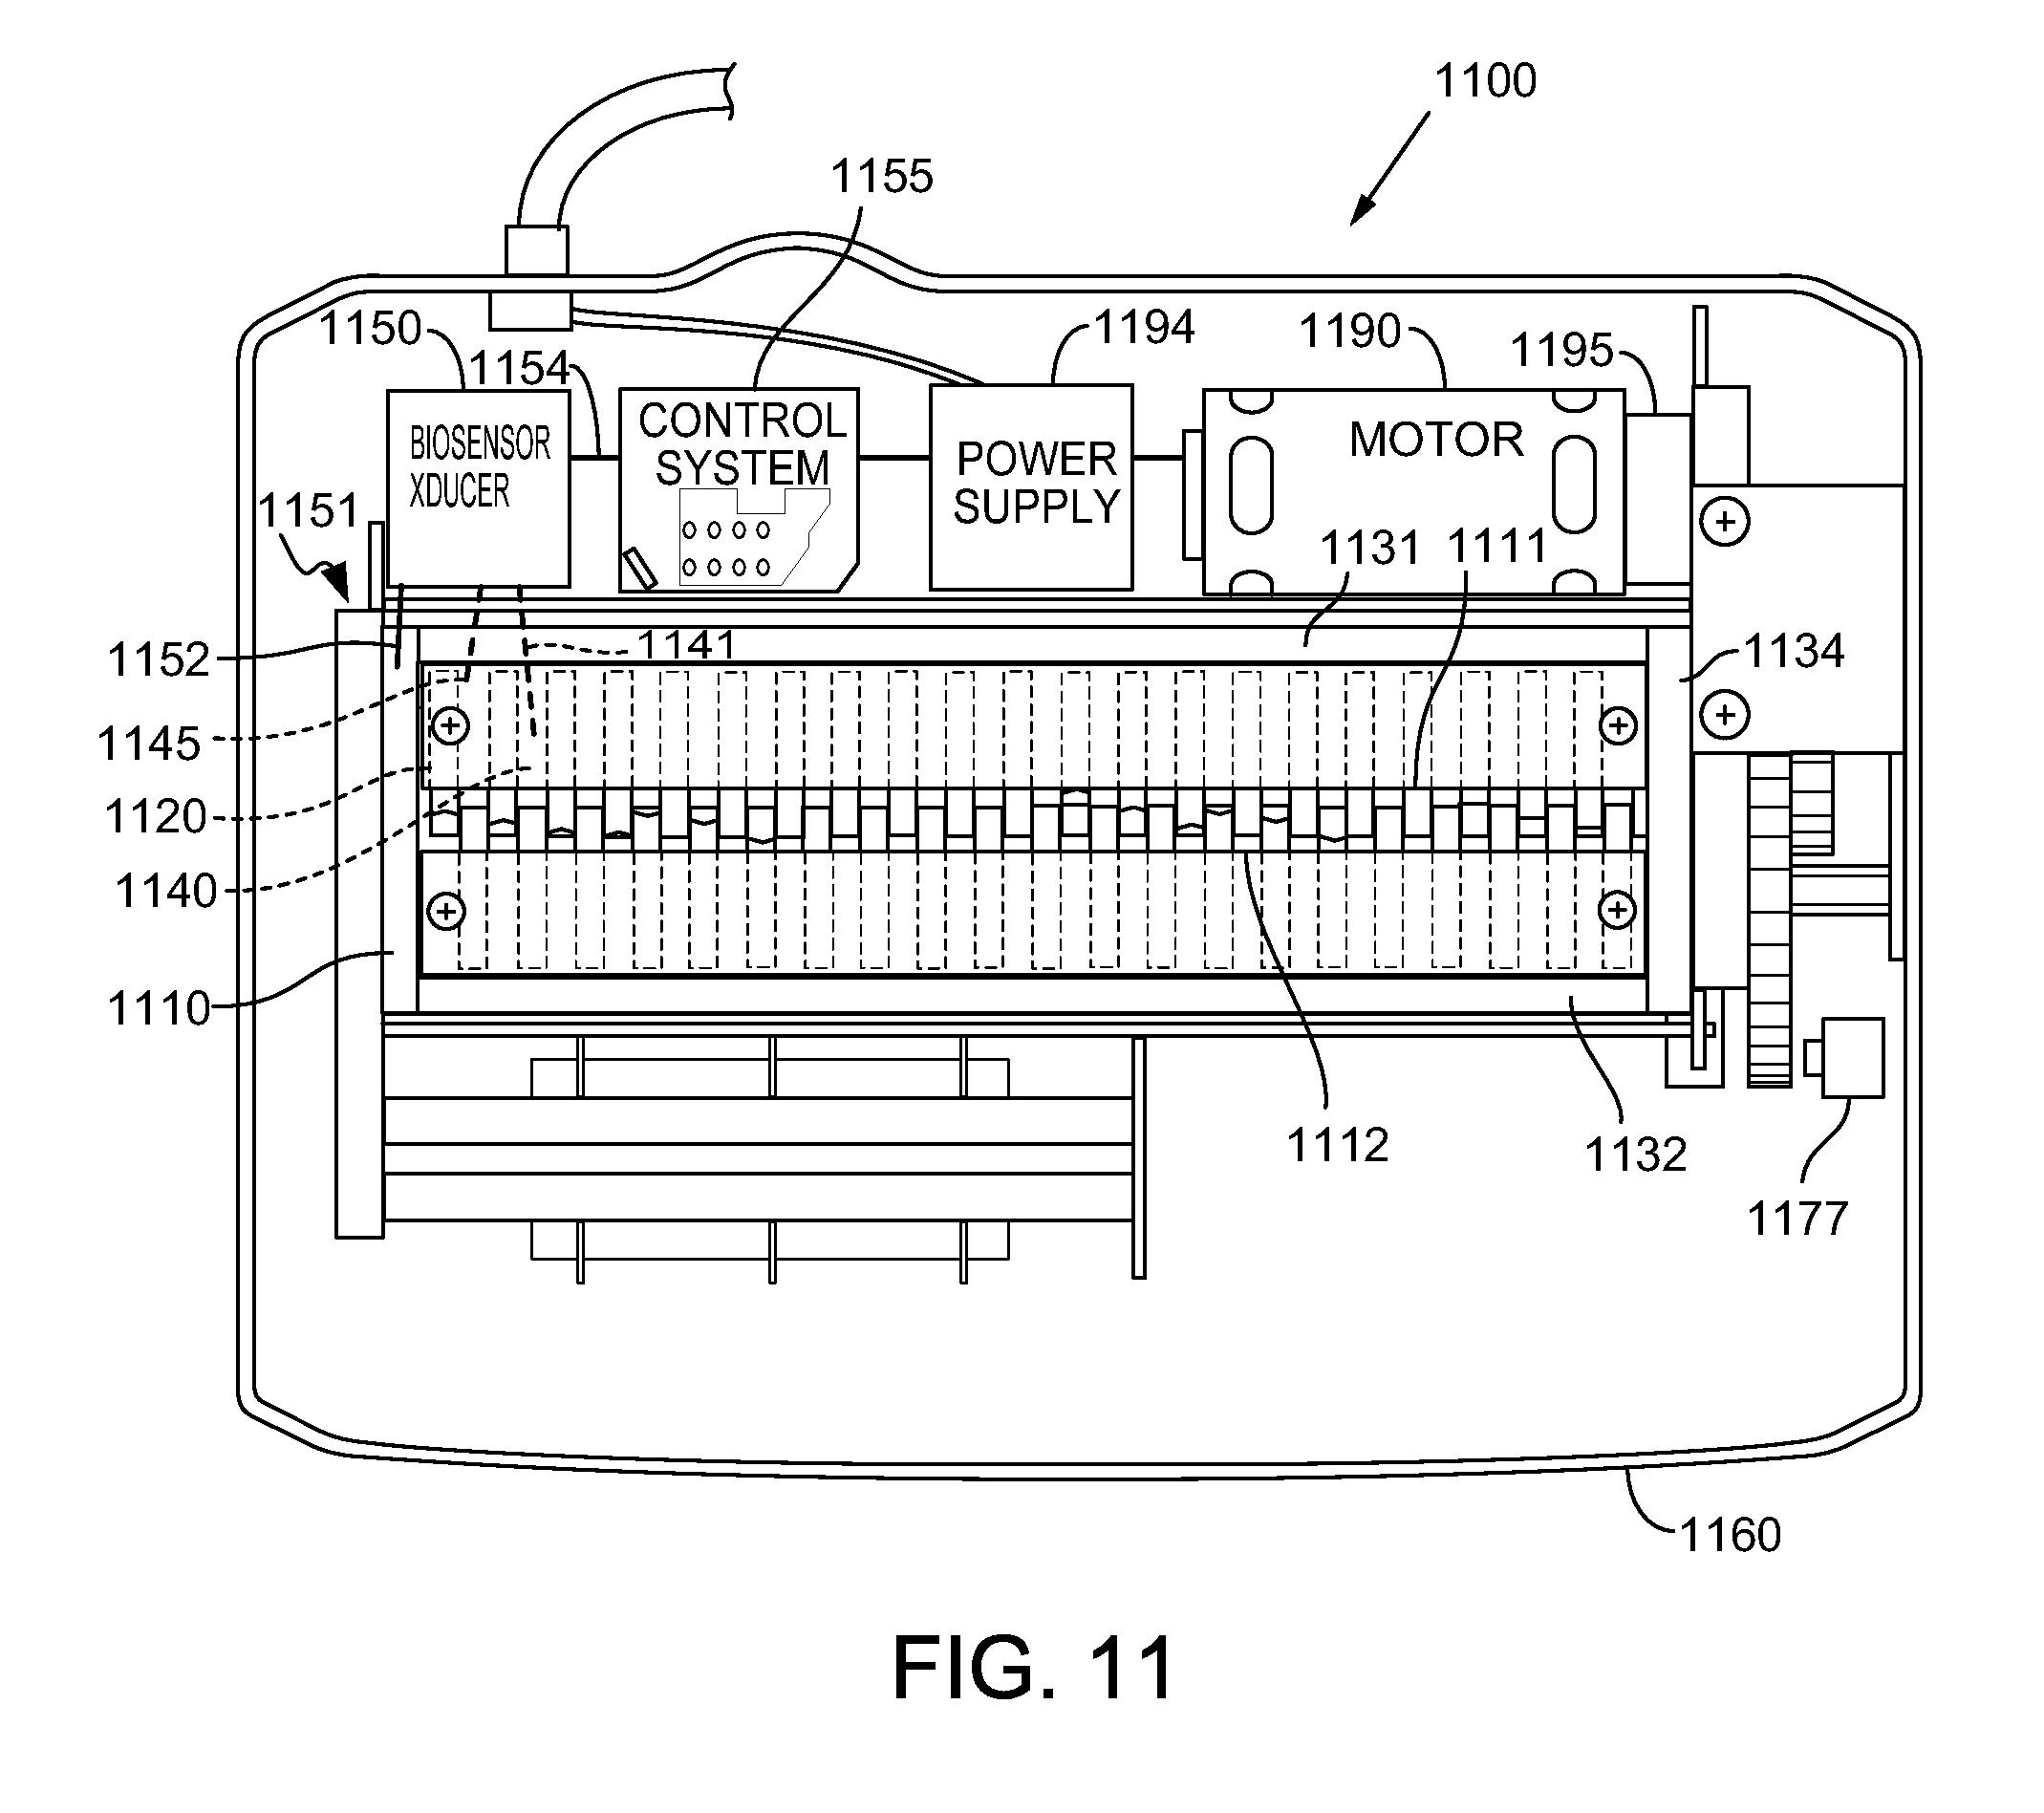 US08754552 20140617 D00011 paper shedder motor capacitor wiring diagram wound rotor motor paper shredder motor wiring diagram at crackthecode.co